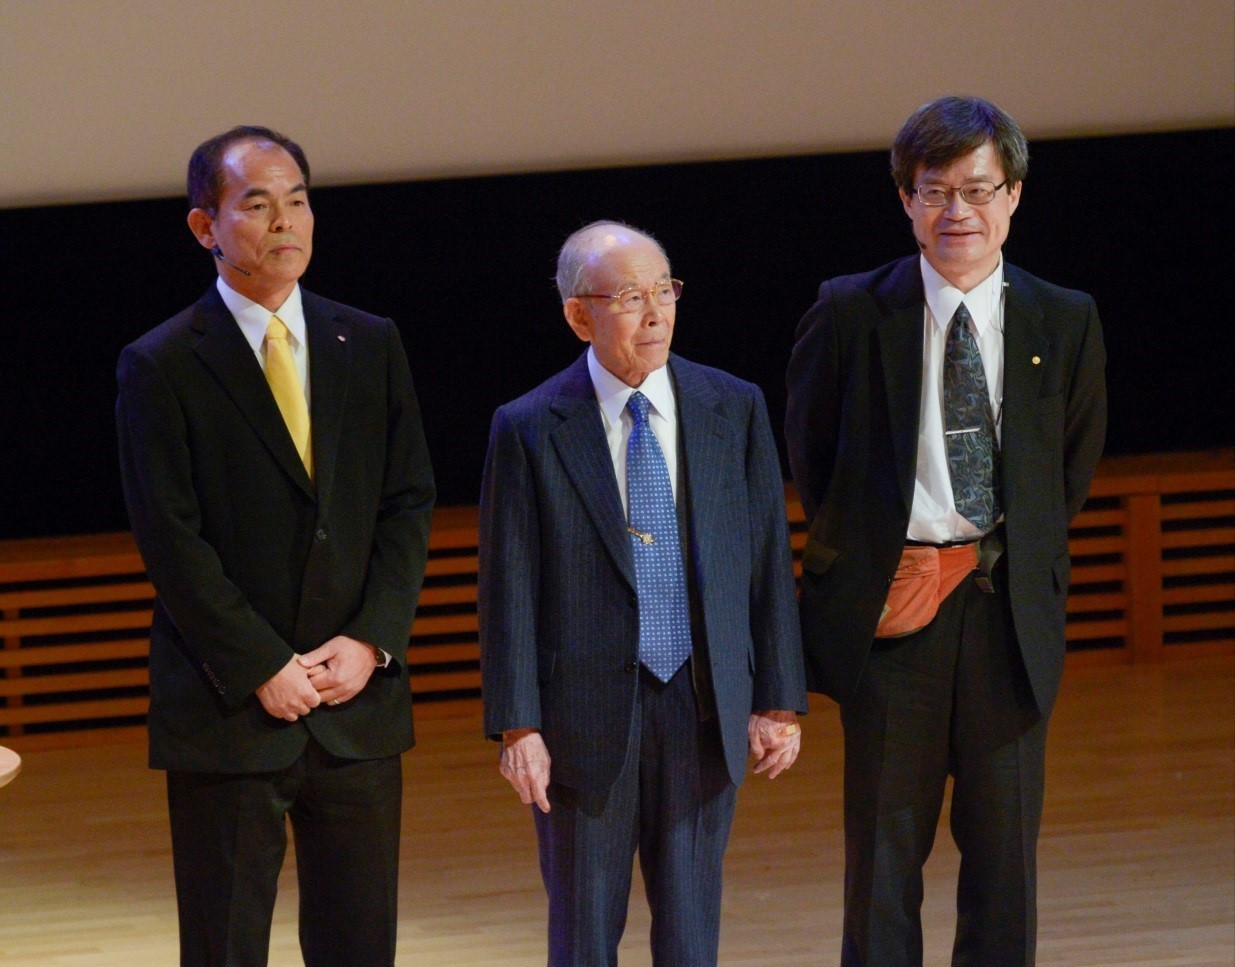 Nobel physics laureates 2014 Professor Shuji Nakamura, Professor Isamu Akasaki and Professor Hiroshi Amano